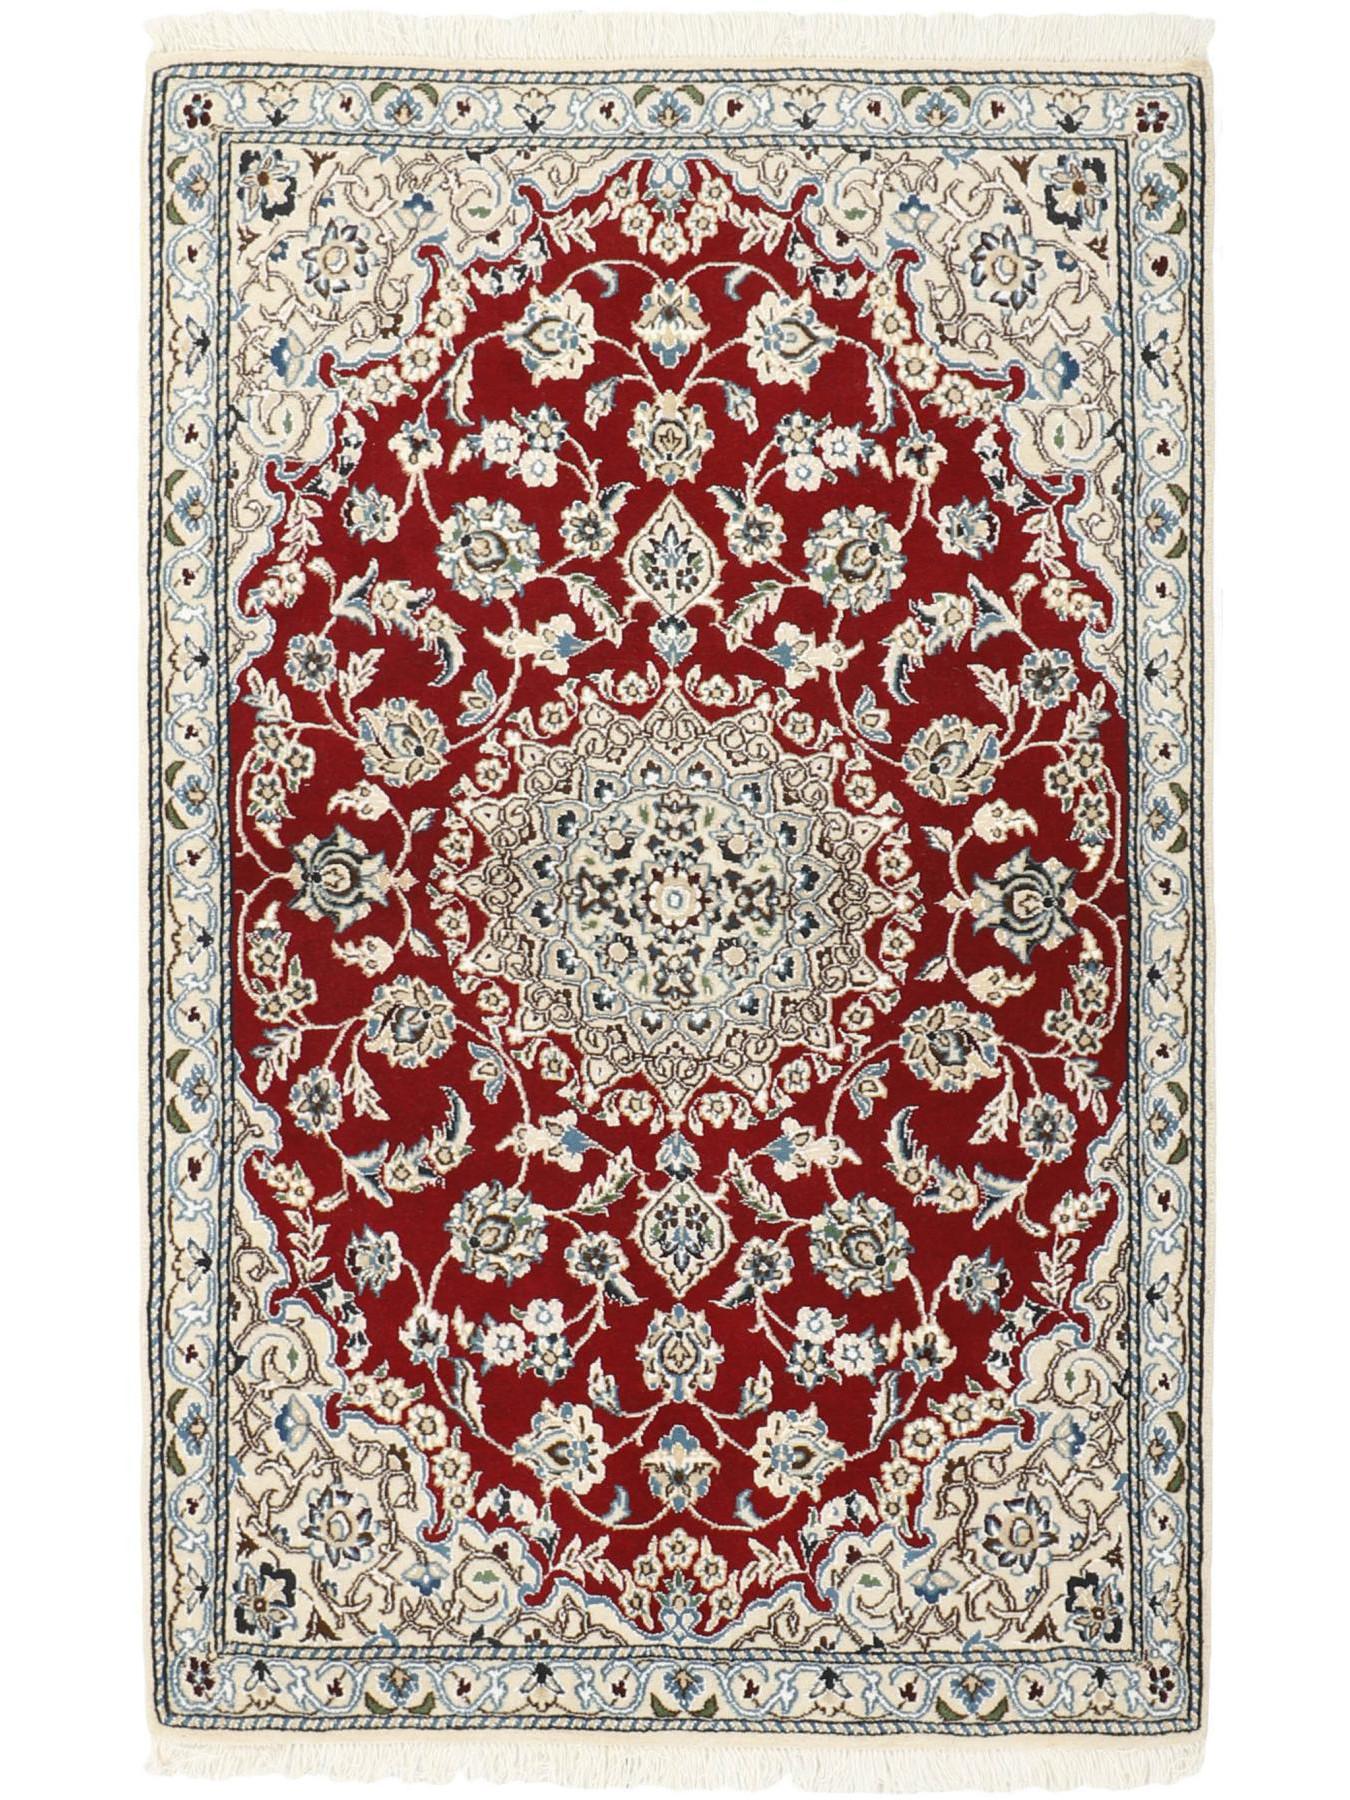 Perzische tapijten - Nain 9la